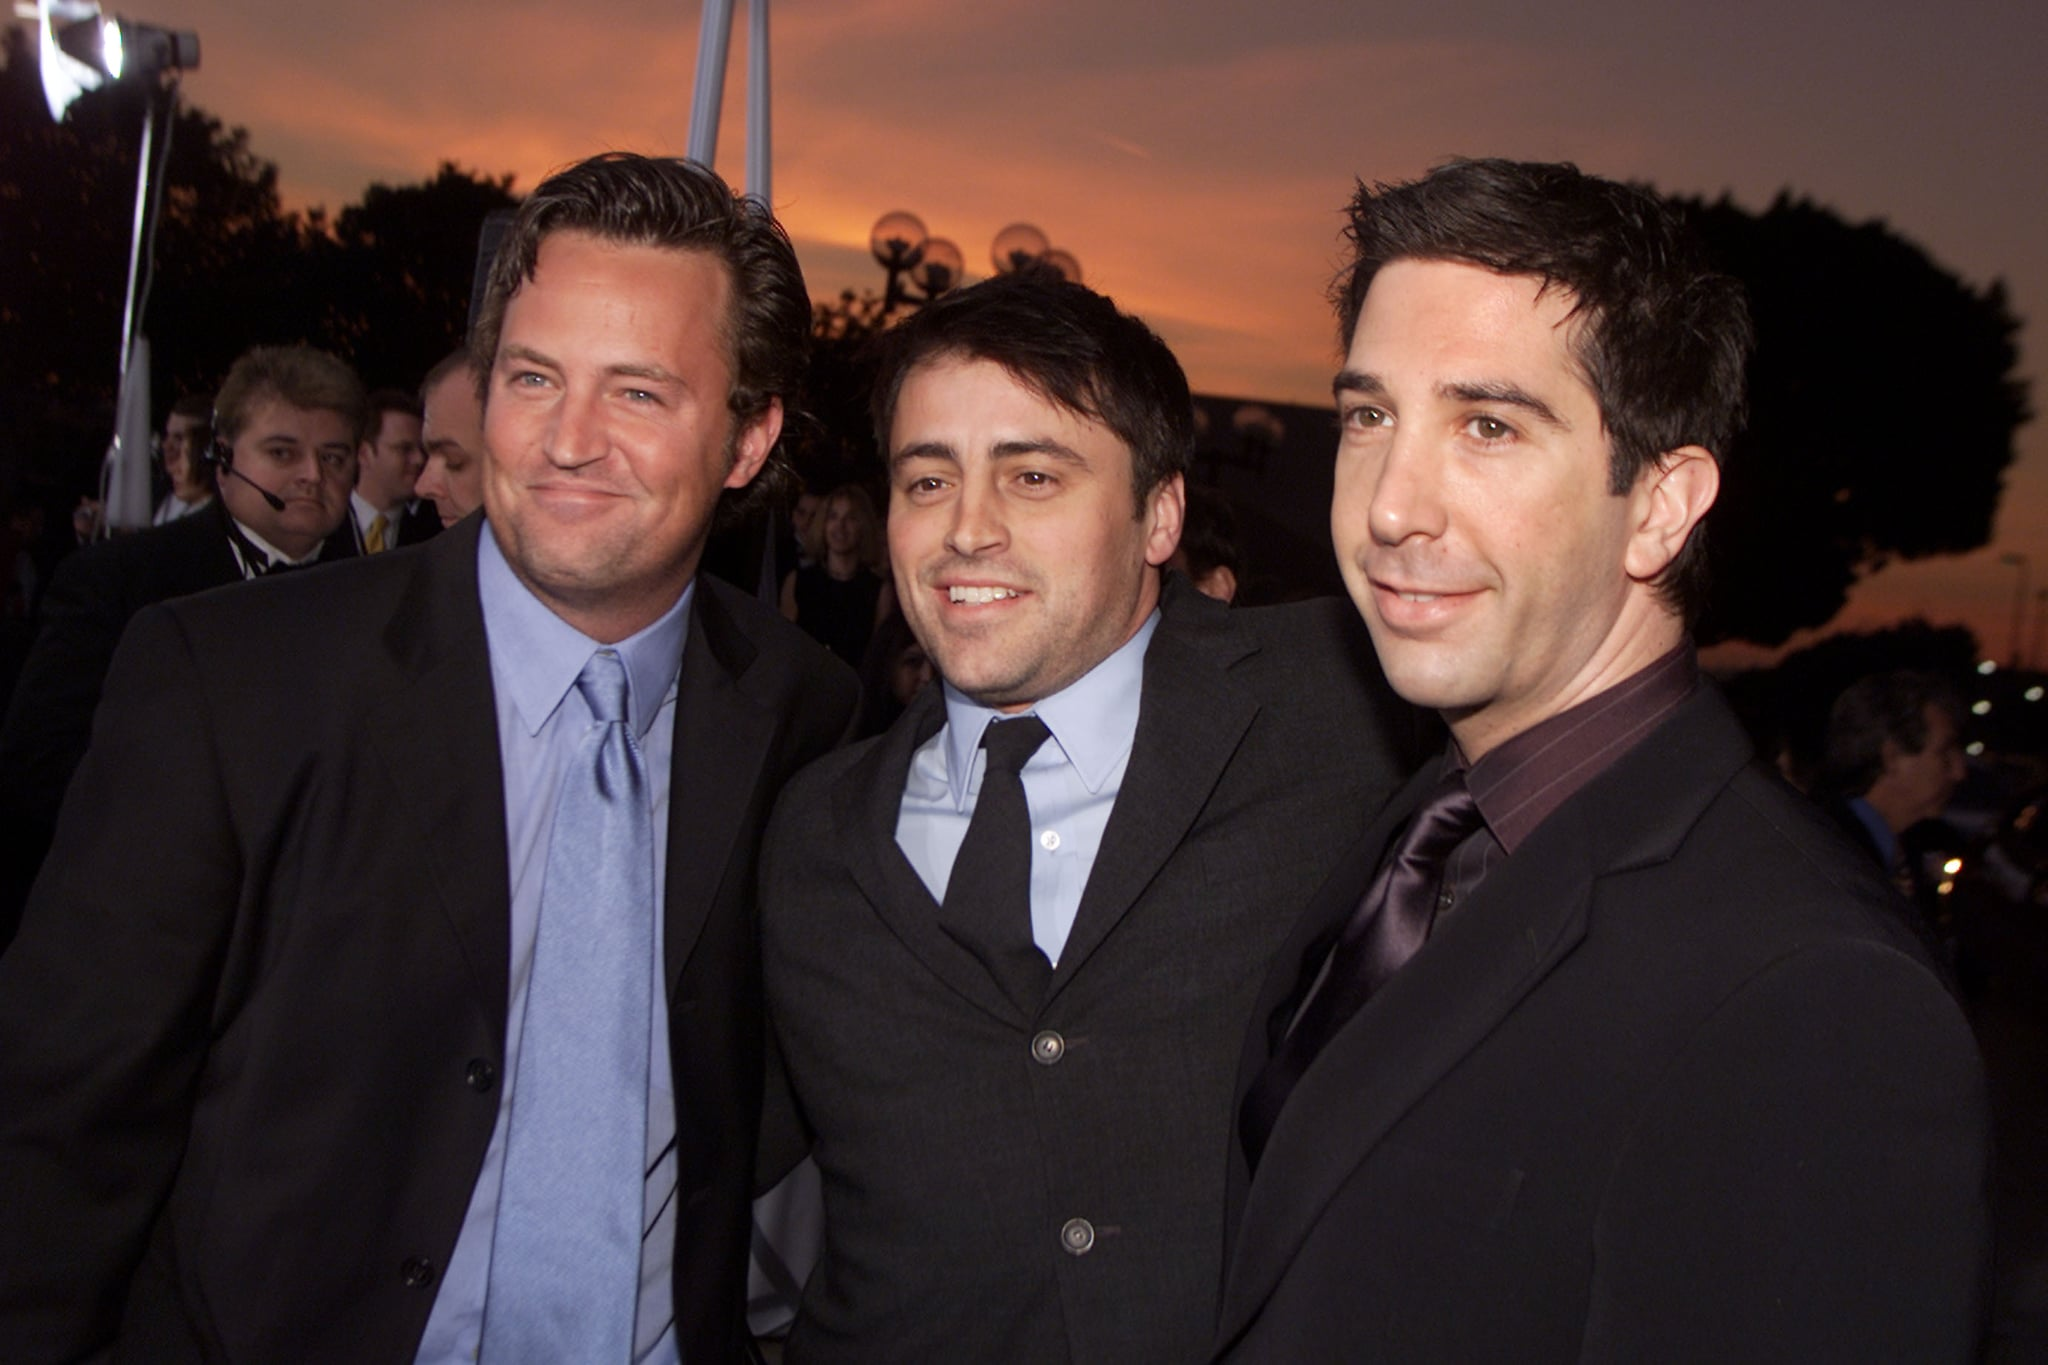 The guys of Friends — Matthew Perry, Matt LeBlanc, and David